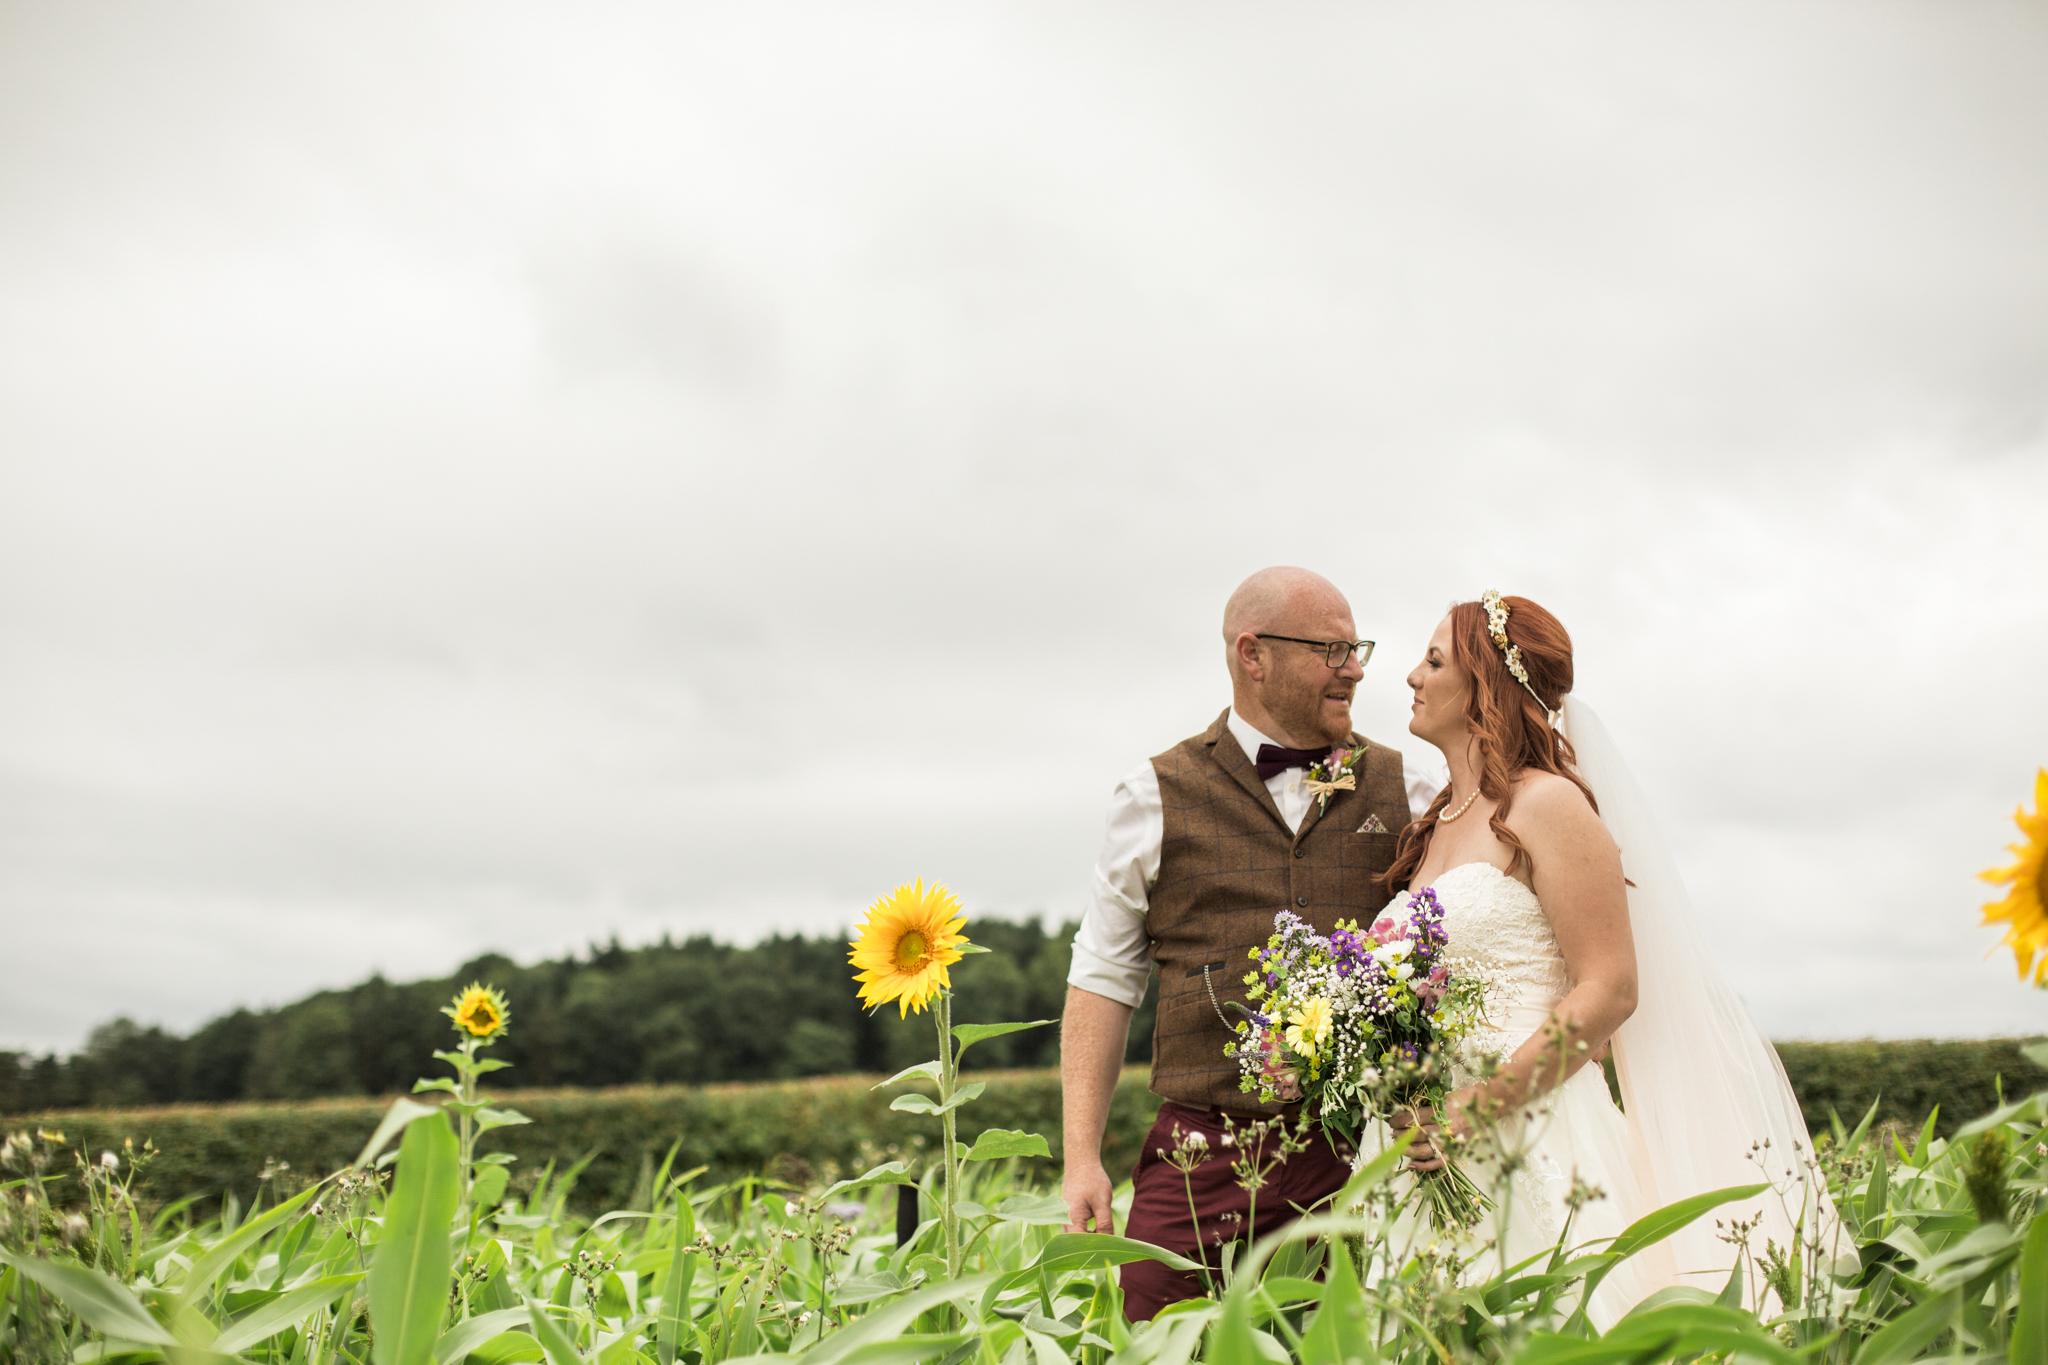 Rowsie & Lee, Swallows Nest Barn Wedding, Cotswold wedding photographer, Warwickshire Wedding Photographer-90.jpg